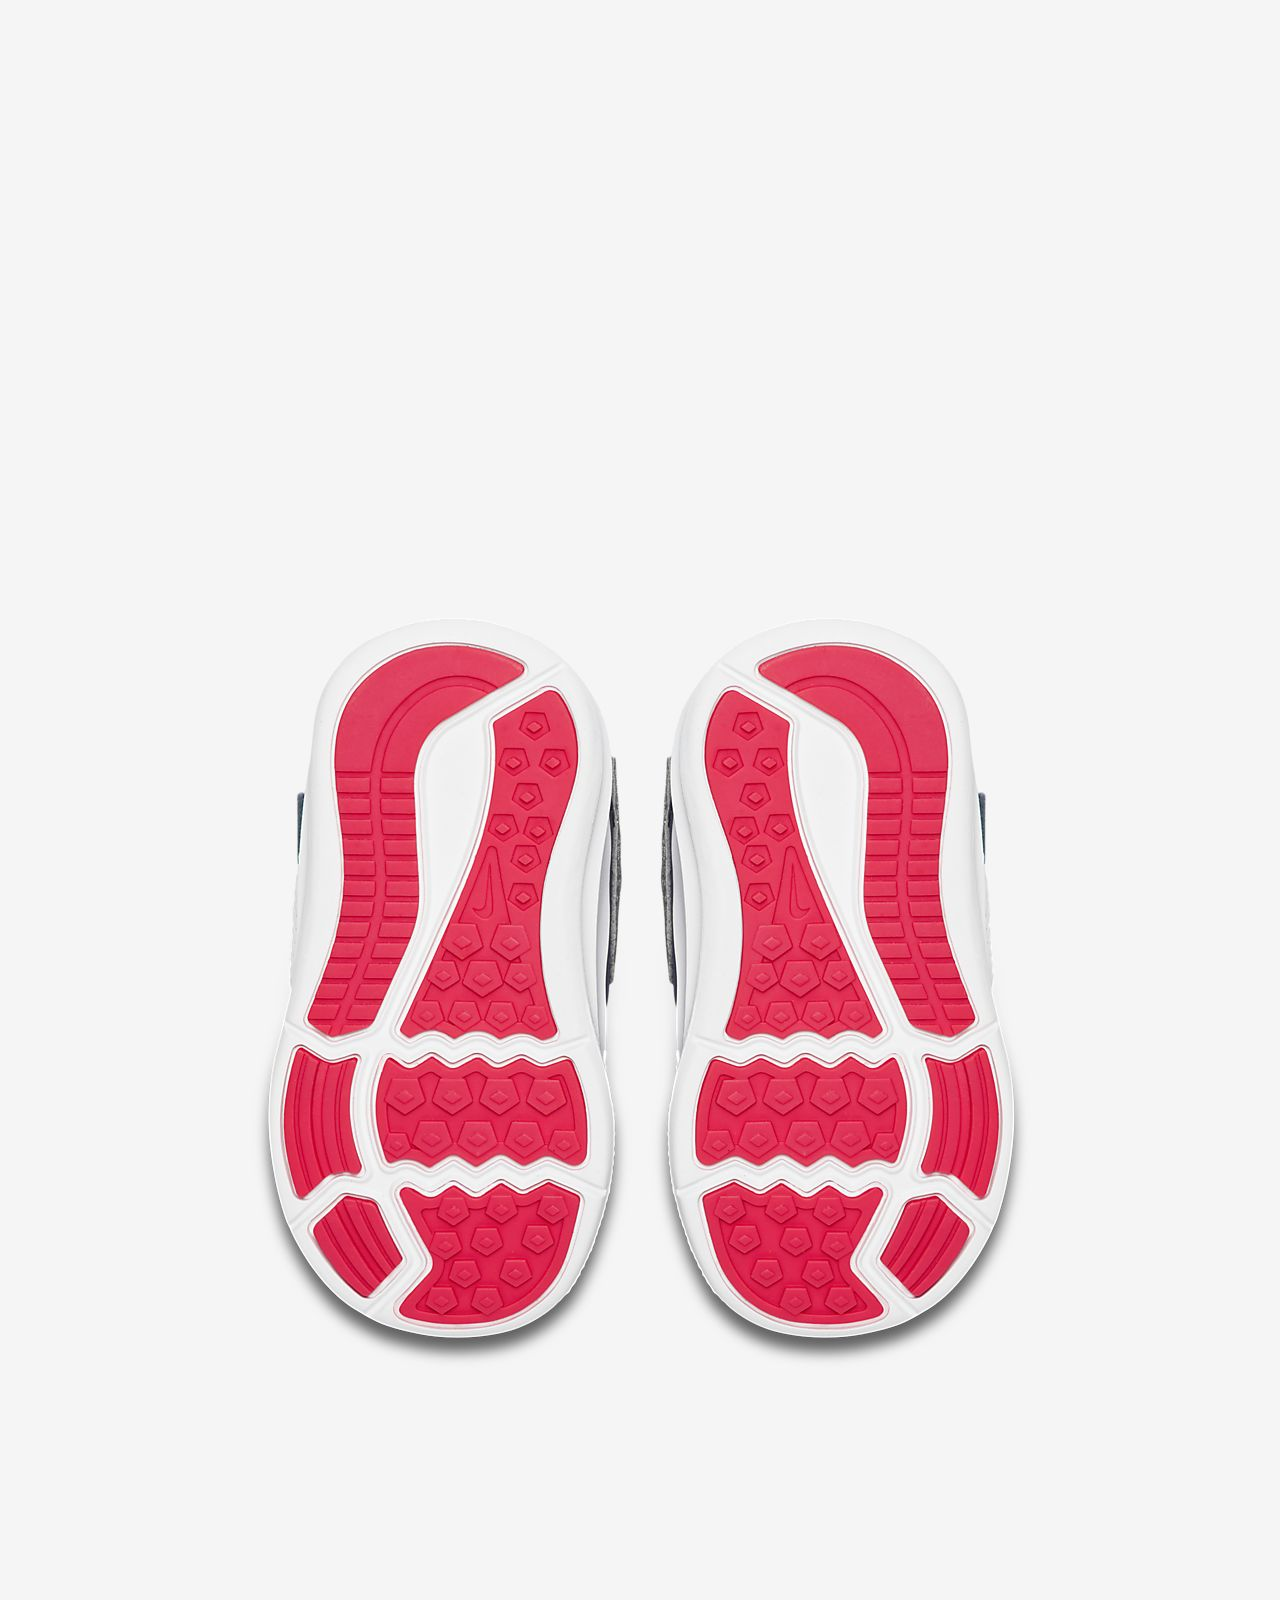 Nike Downshifter 7 Baby & Toddler Shoe